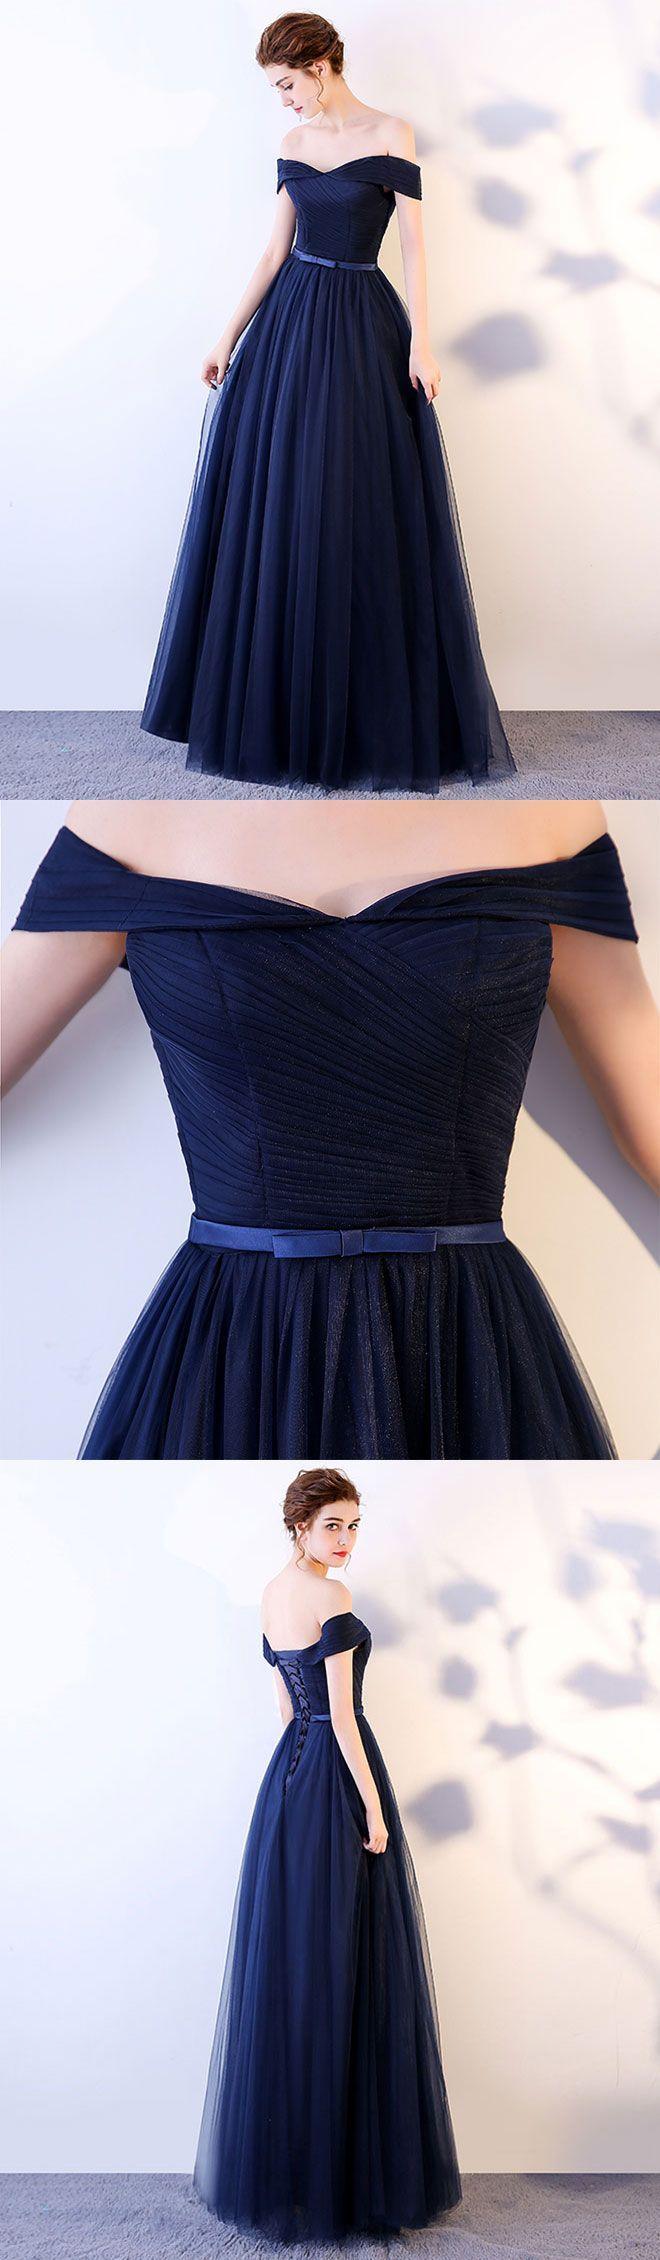 Dark blue long prom dress, blue tulle evening dress #eveningdresses